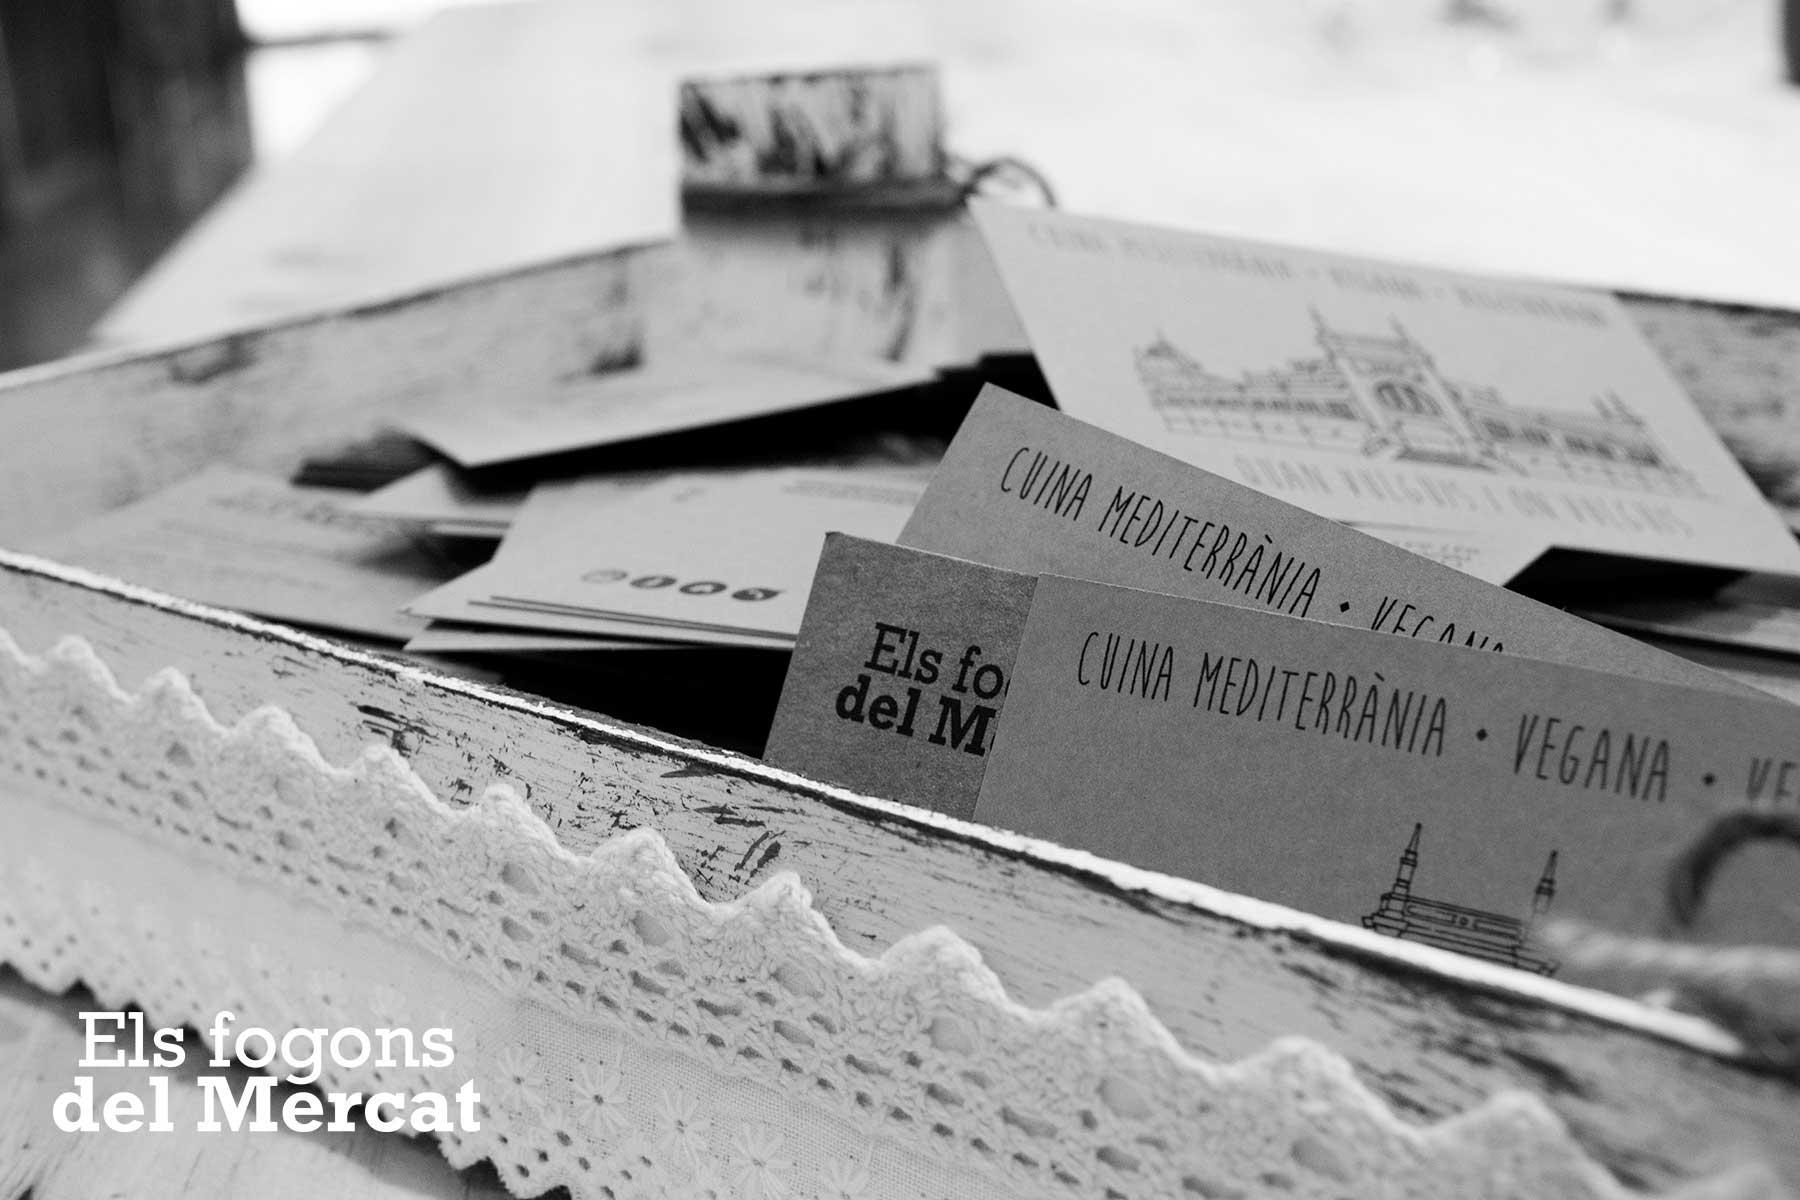 -diseno-grafico-fotografia-branding-identidad-corporativa-inauguracion-fogons-mercat-5